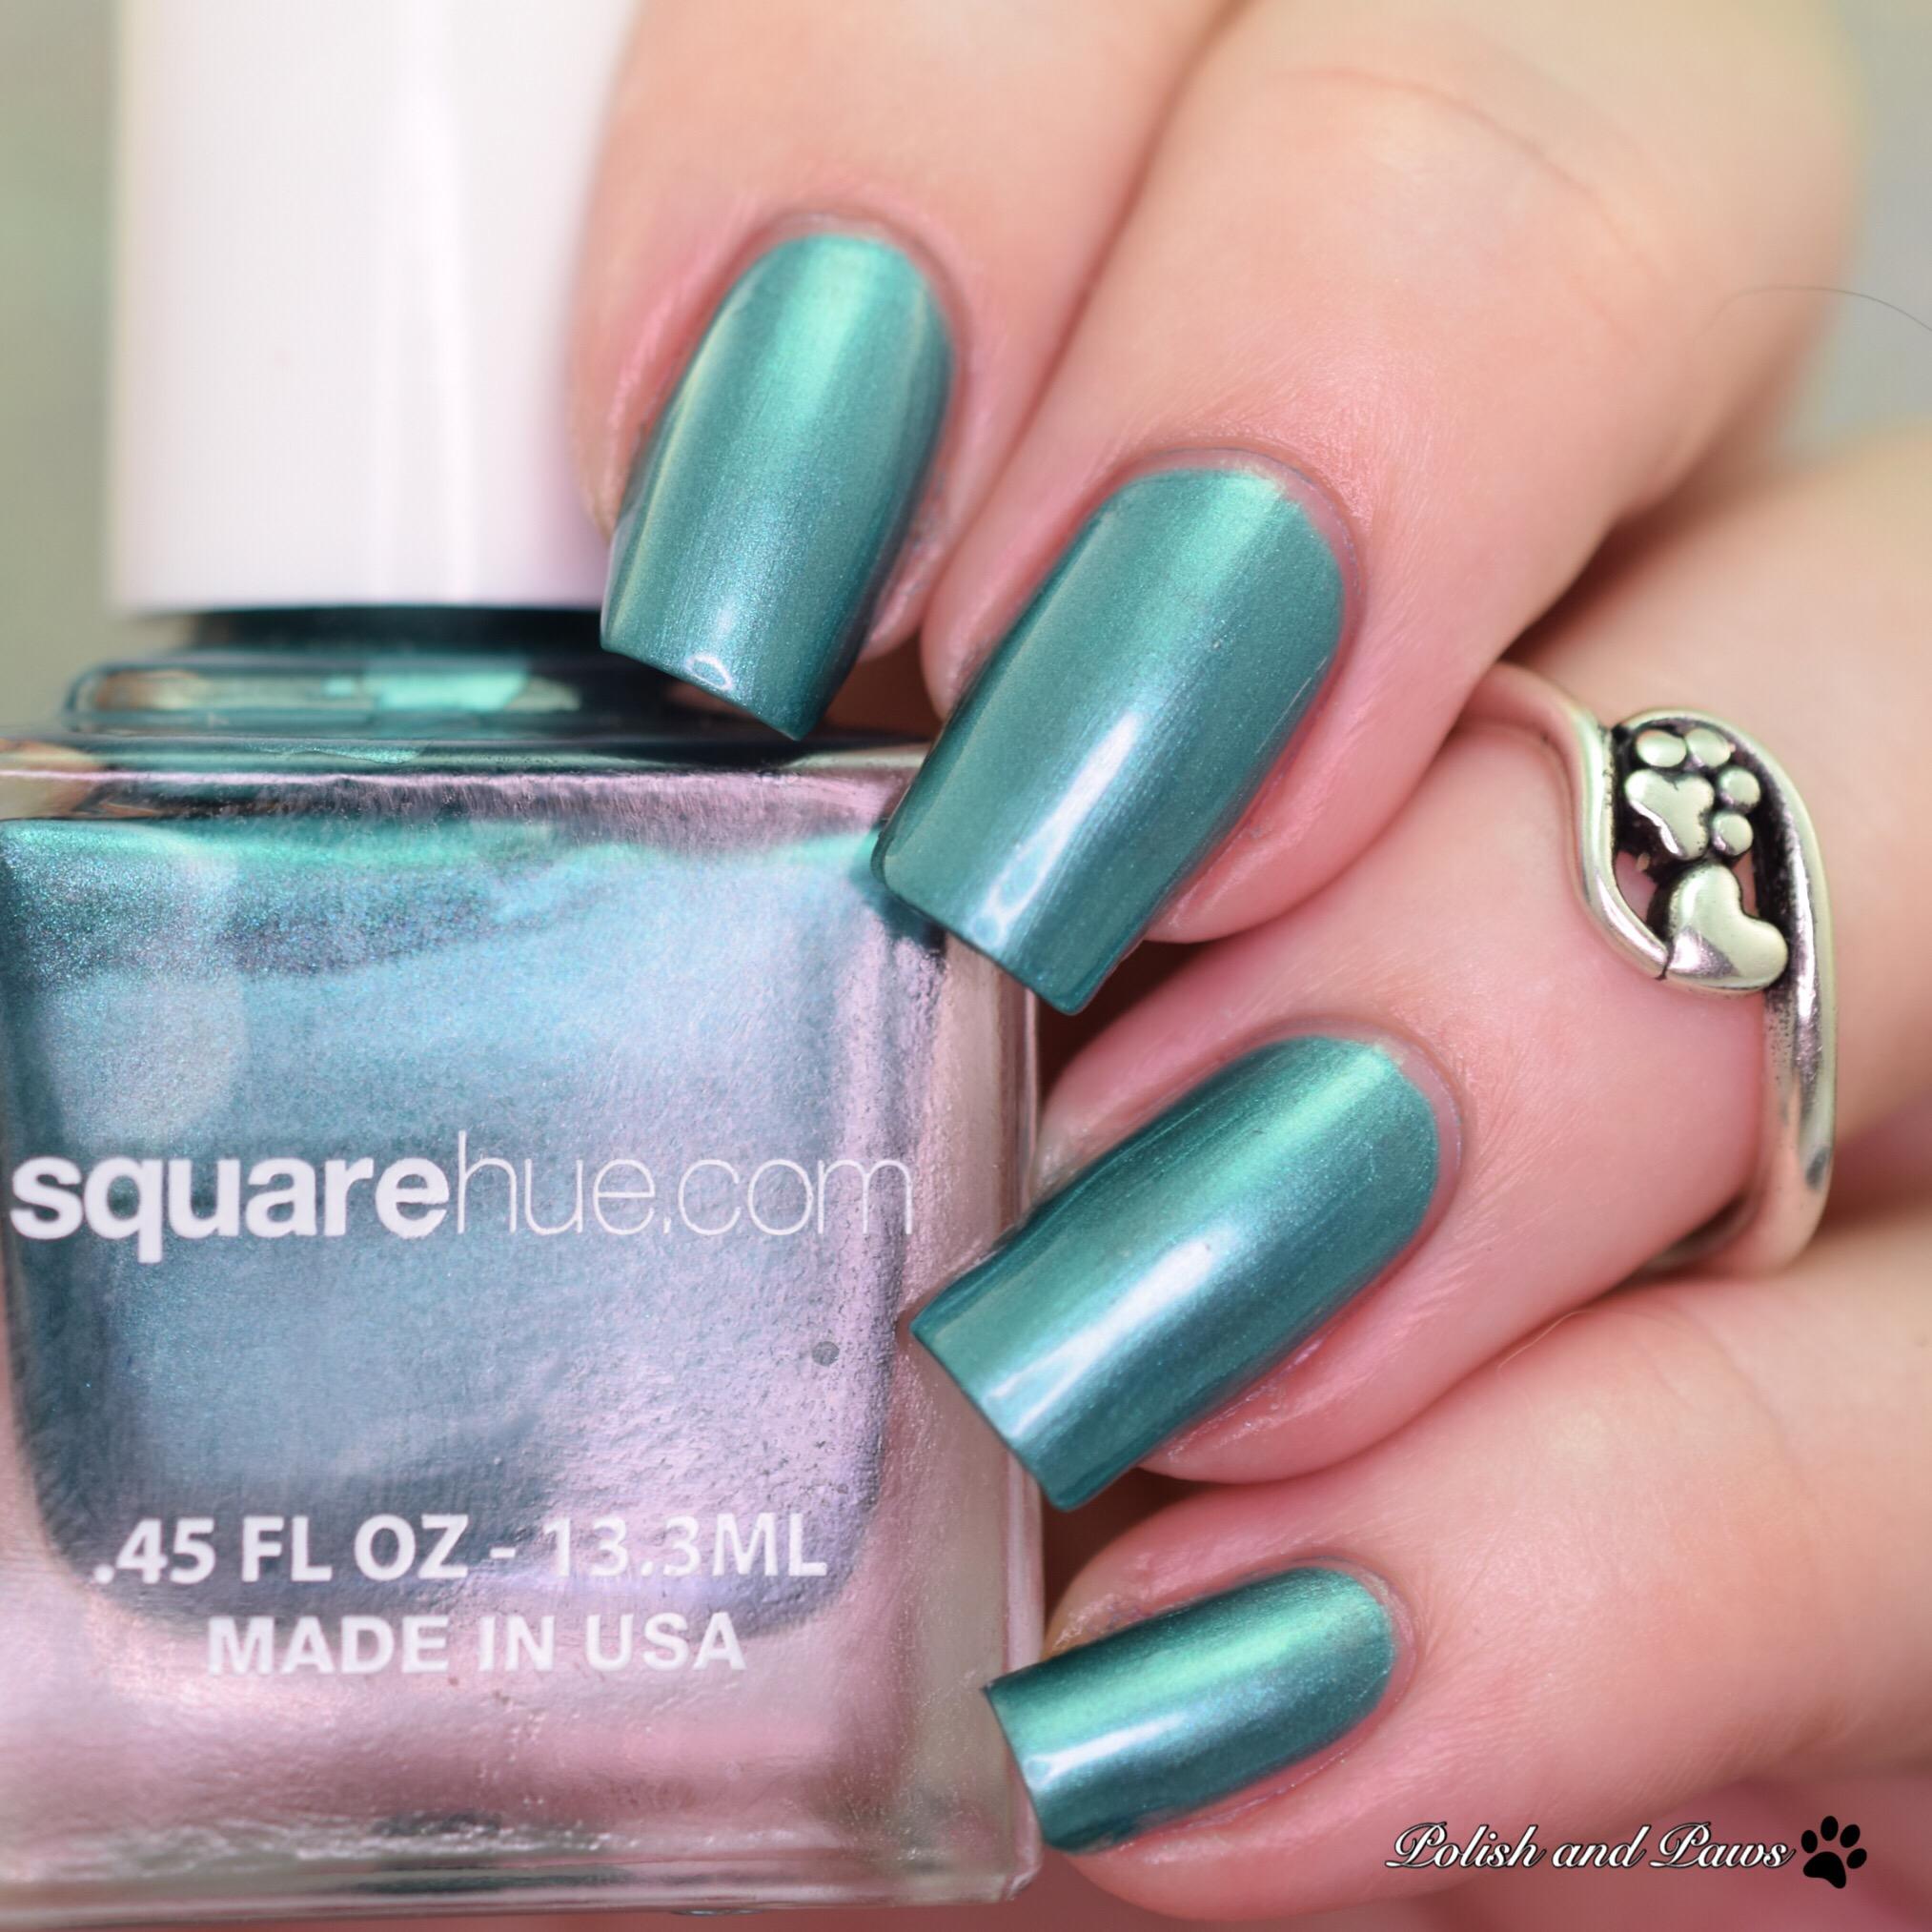 Square Hue Akamai